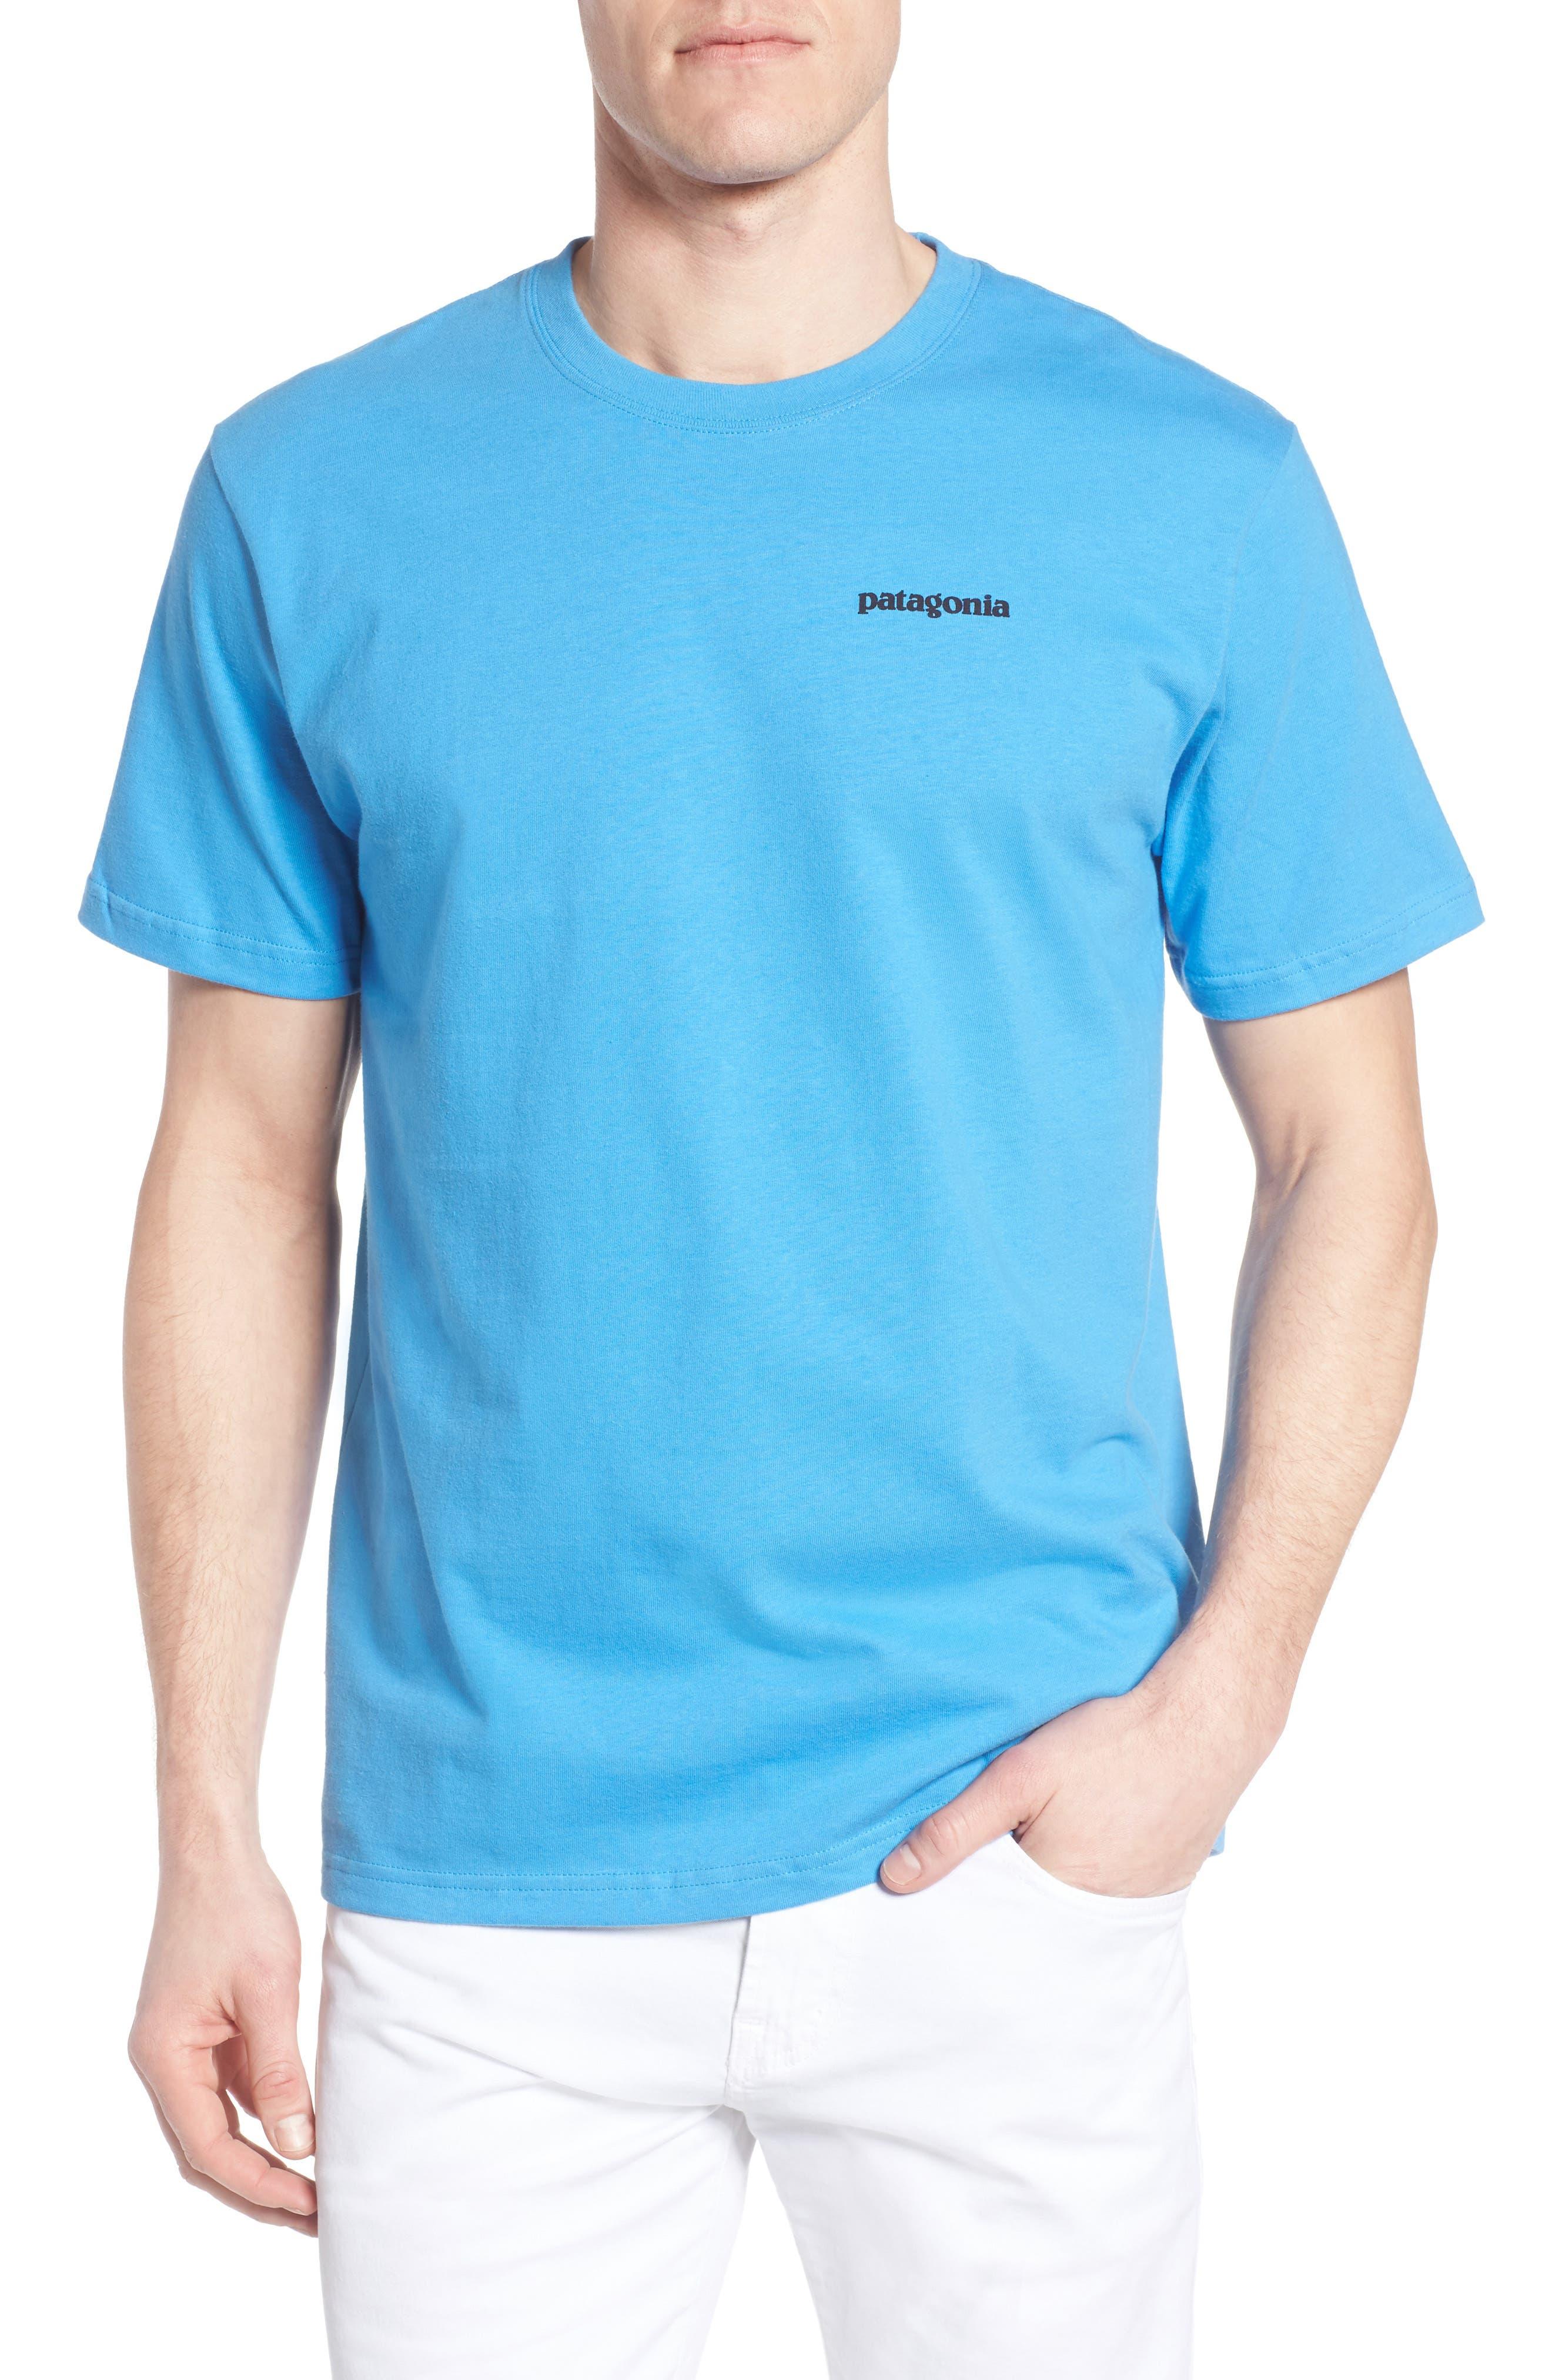 PATAGONIA Trout Fitz Roy Organic Cotton T-Shirt